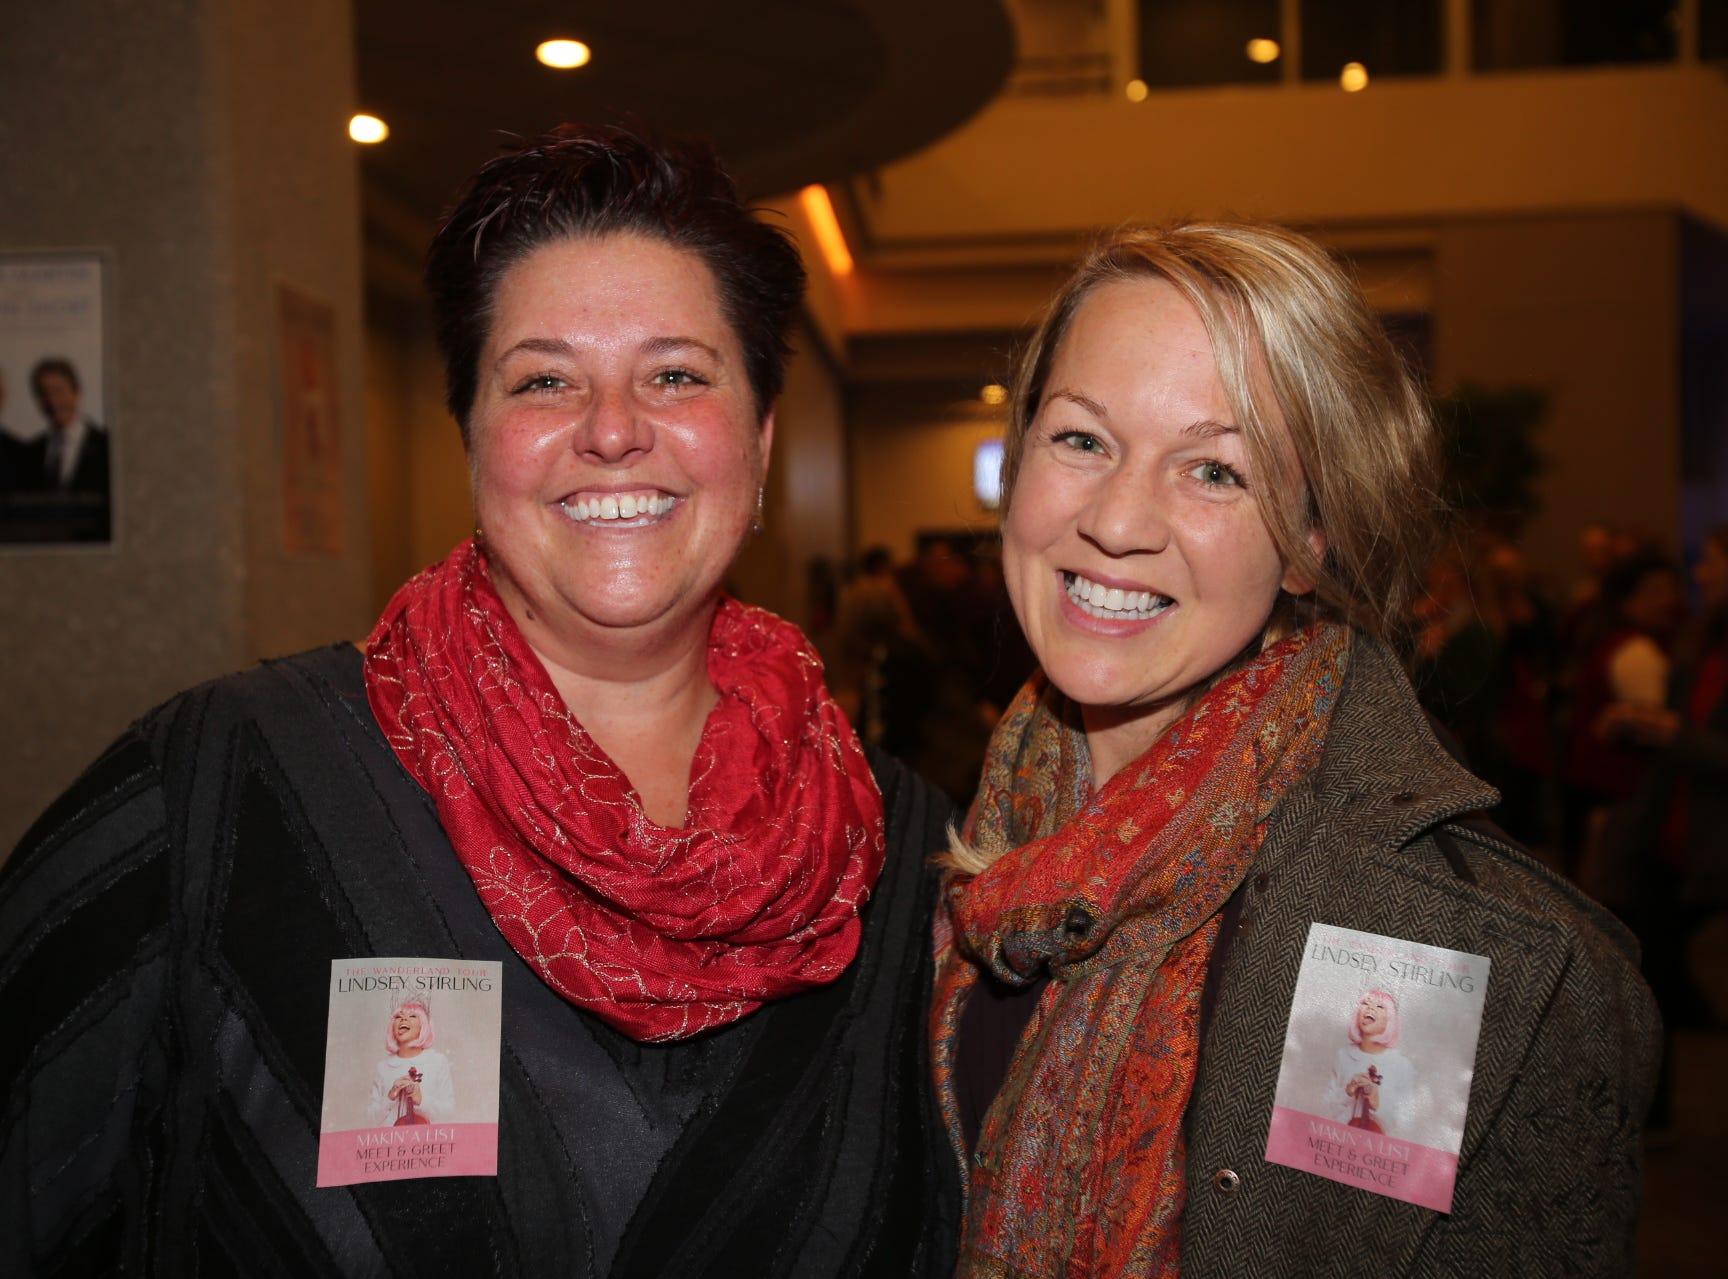 Susie Berry and Nicole Dudas